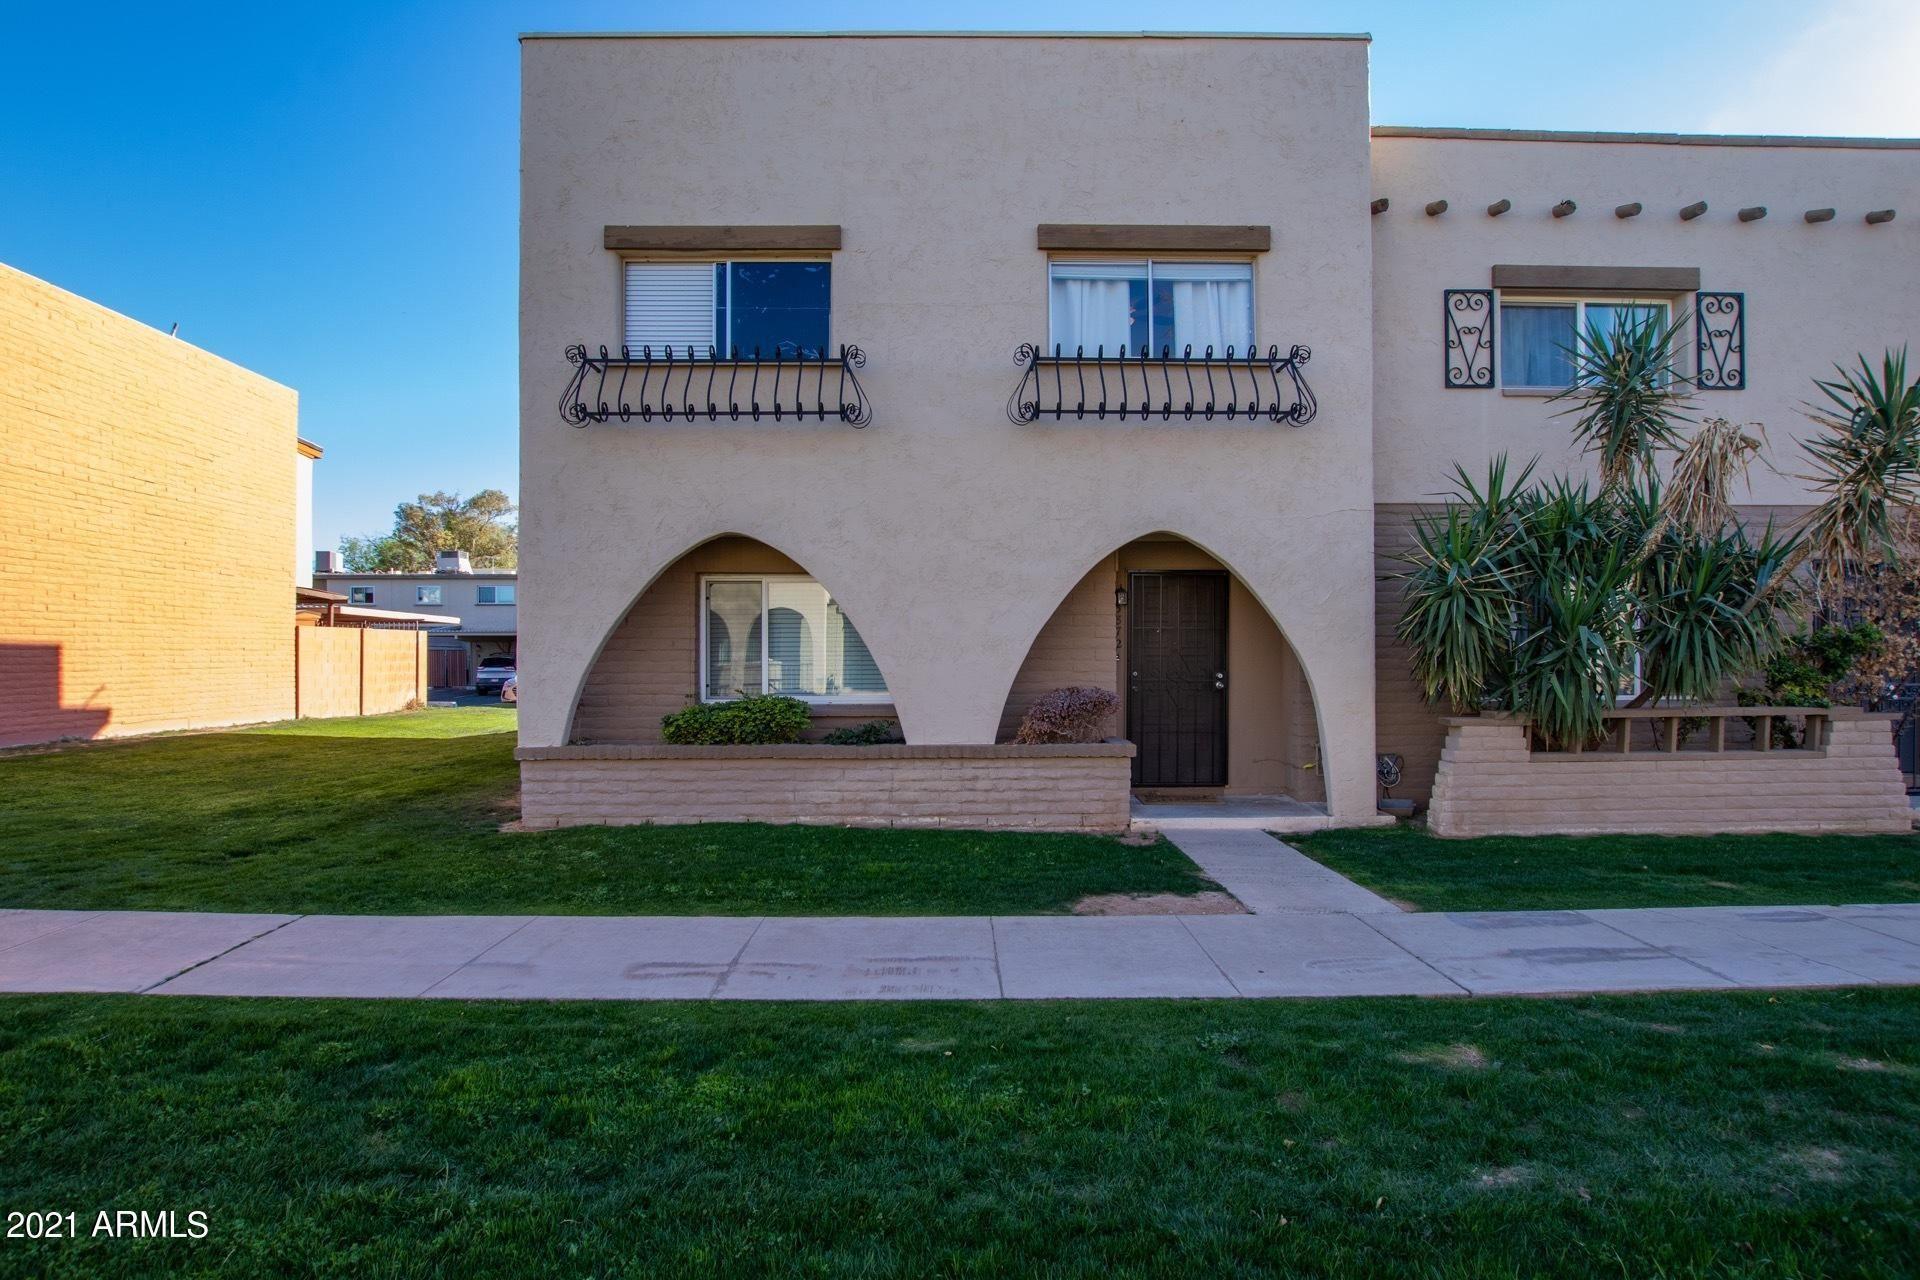 3872 N 30TH Street, Phoenix, AZ 85016 - MLS#: 6197375